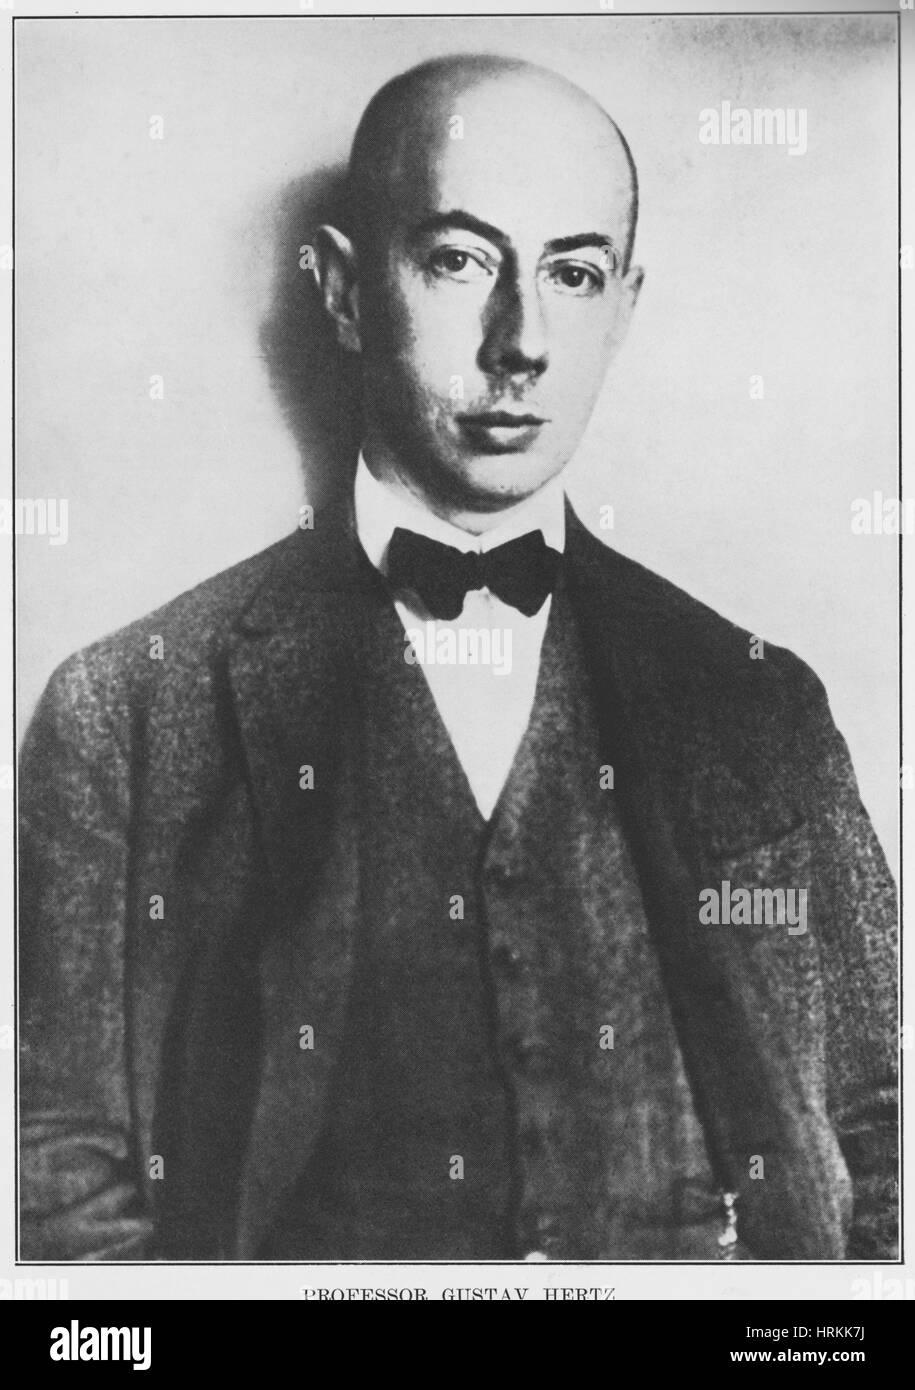 Gustav Ludwig Hertz, German Physicist - Stock Image